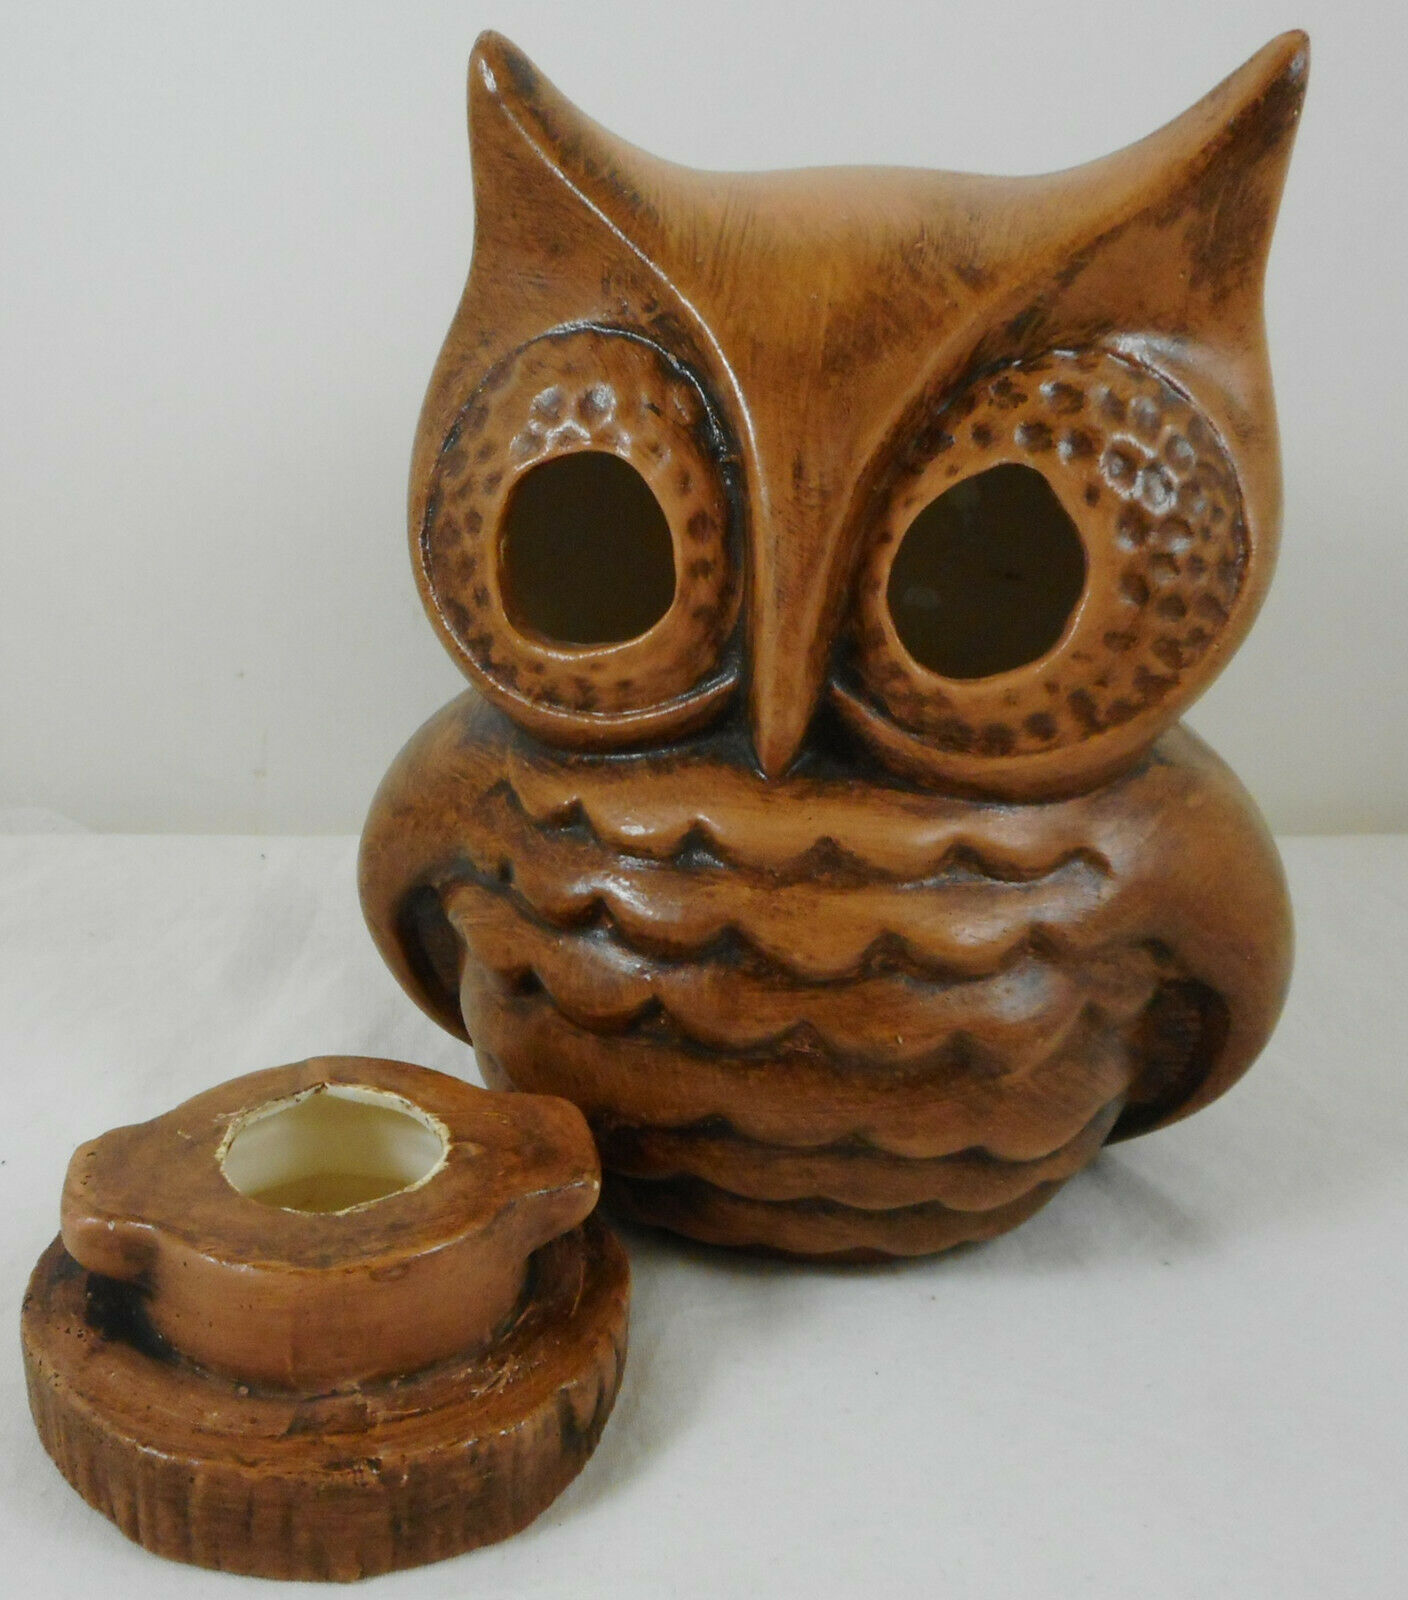 "Vintage Ceramic Owl Candlestick Holder 6"" Tall Brown Figurine"